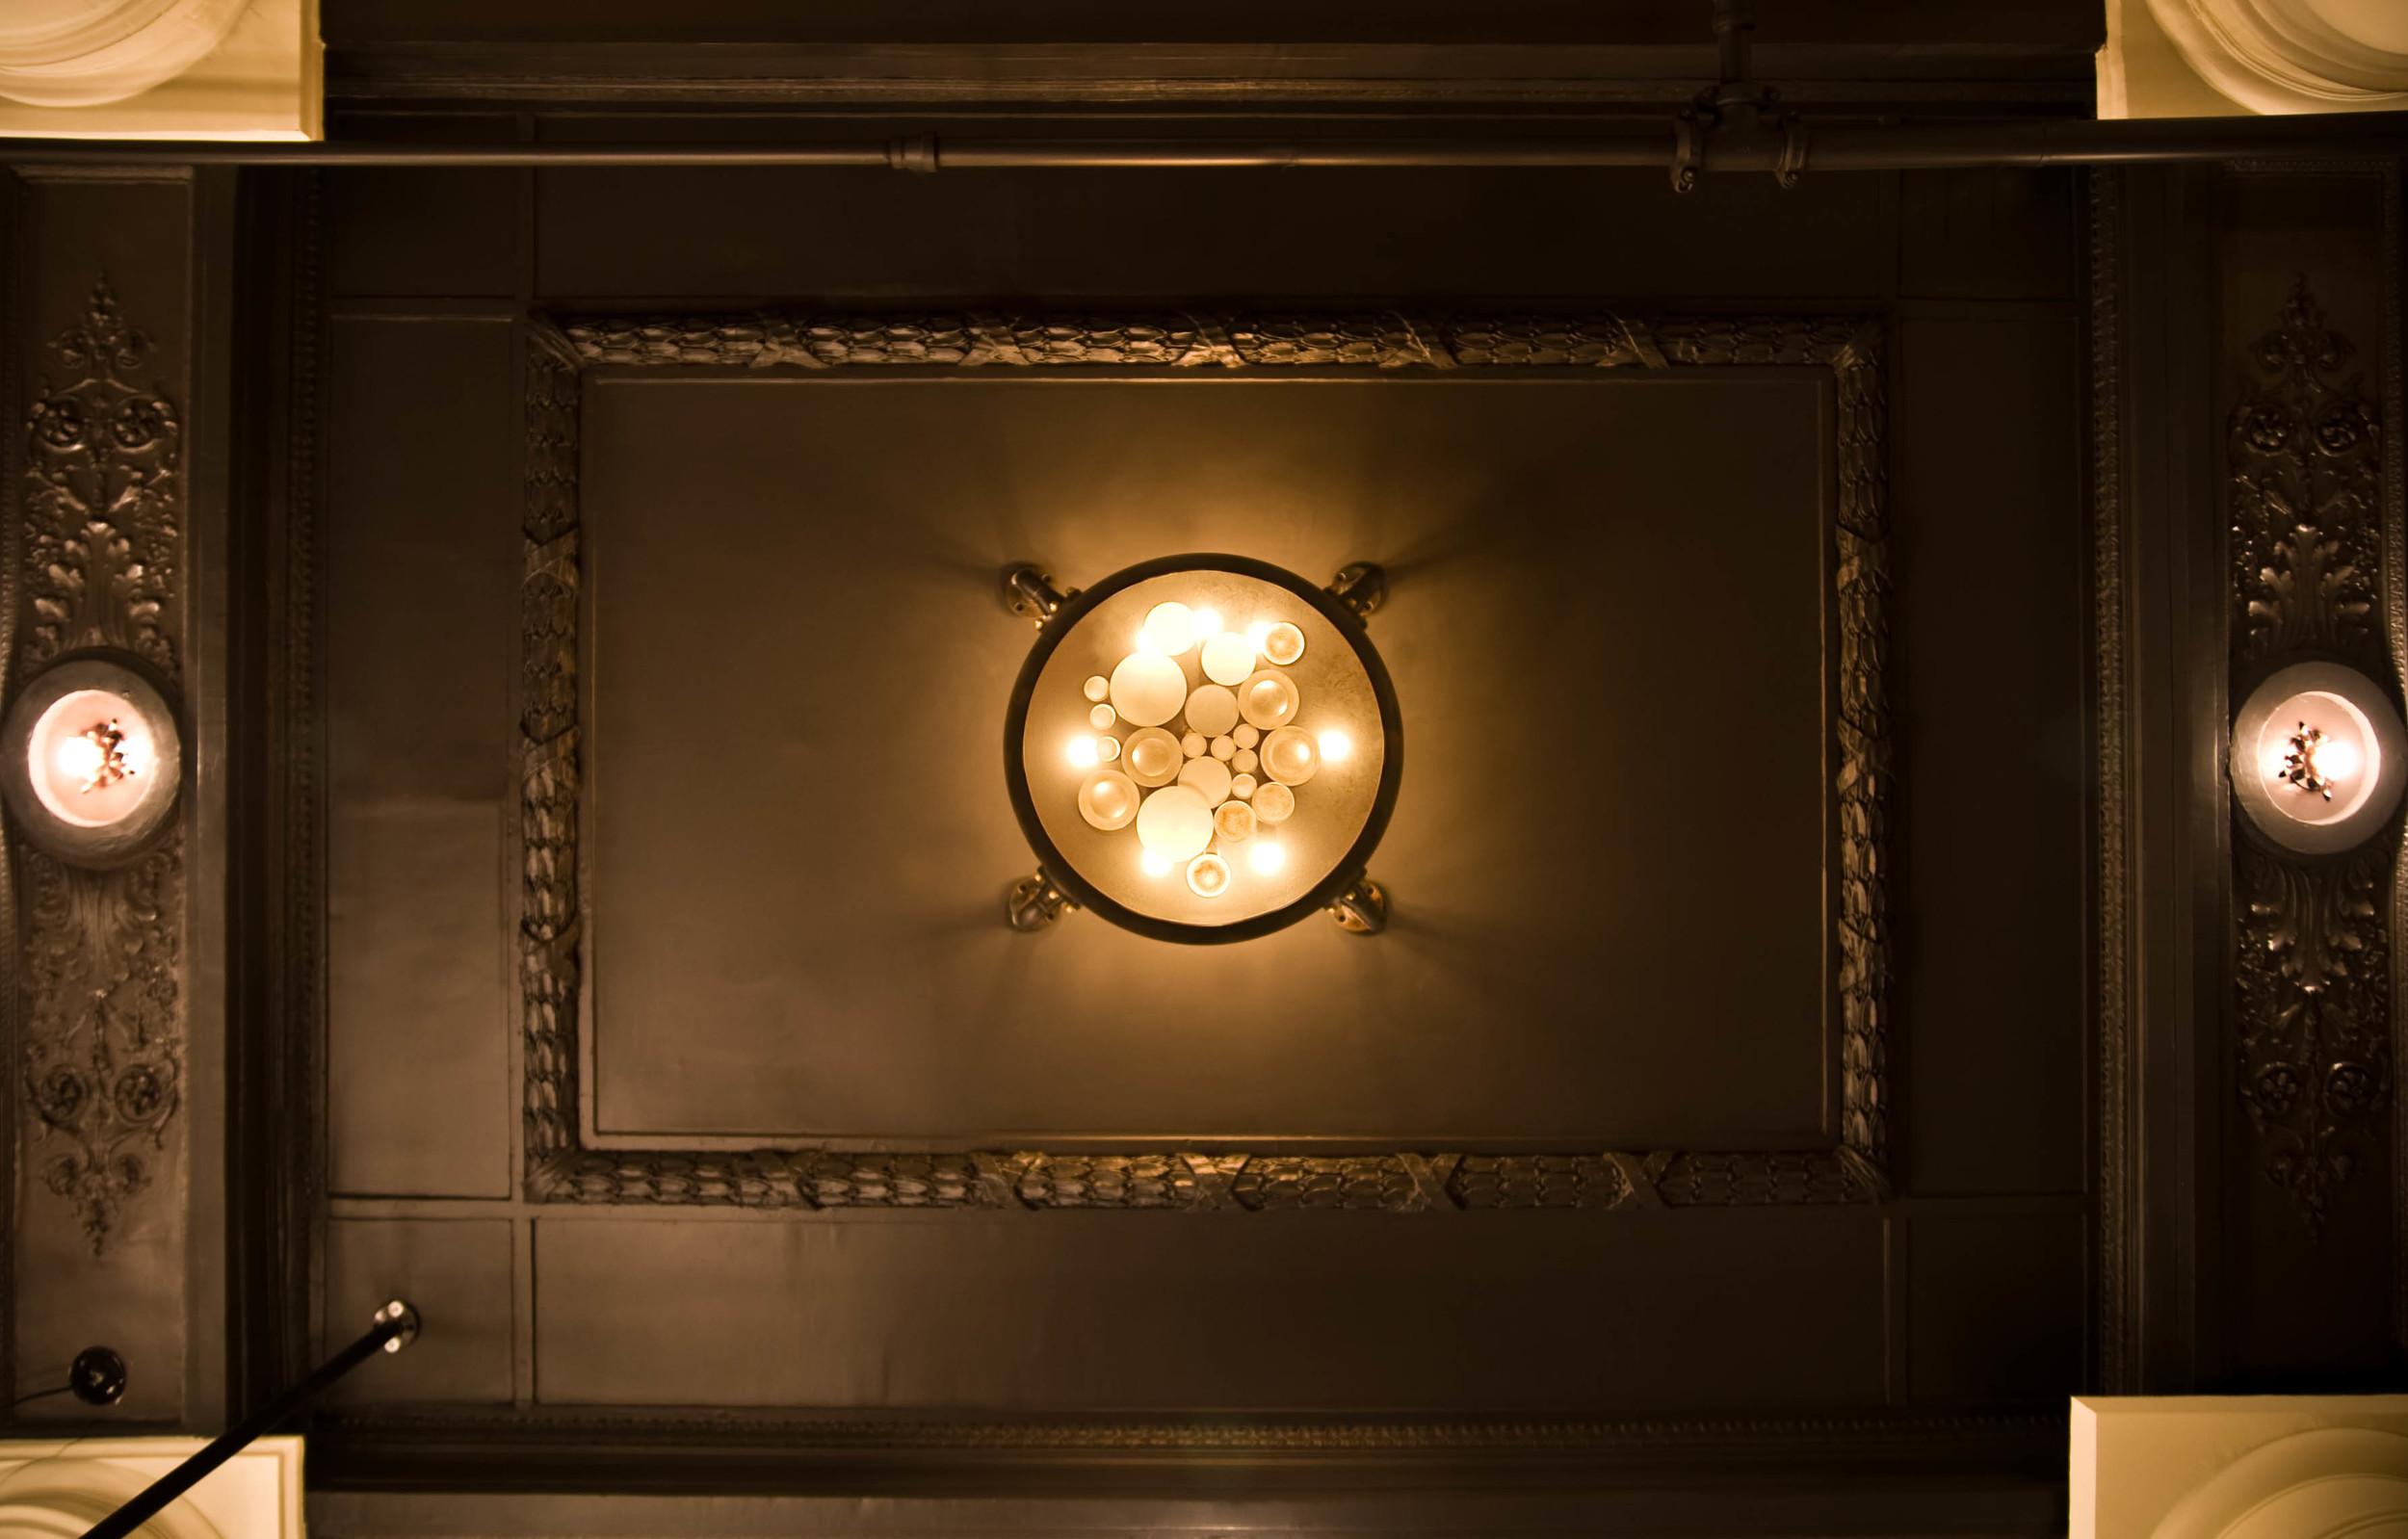 Ace Hotel NYC Ceiling light.jpg